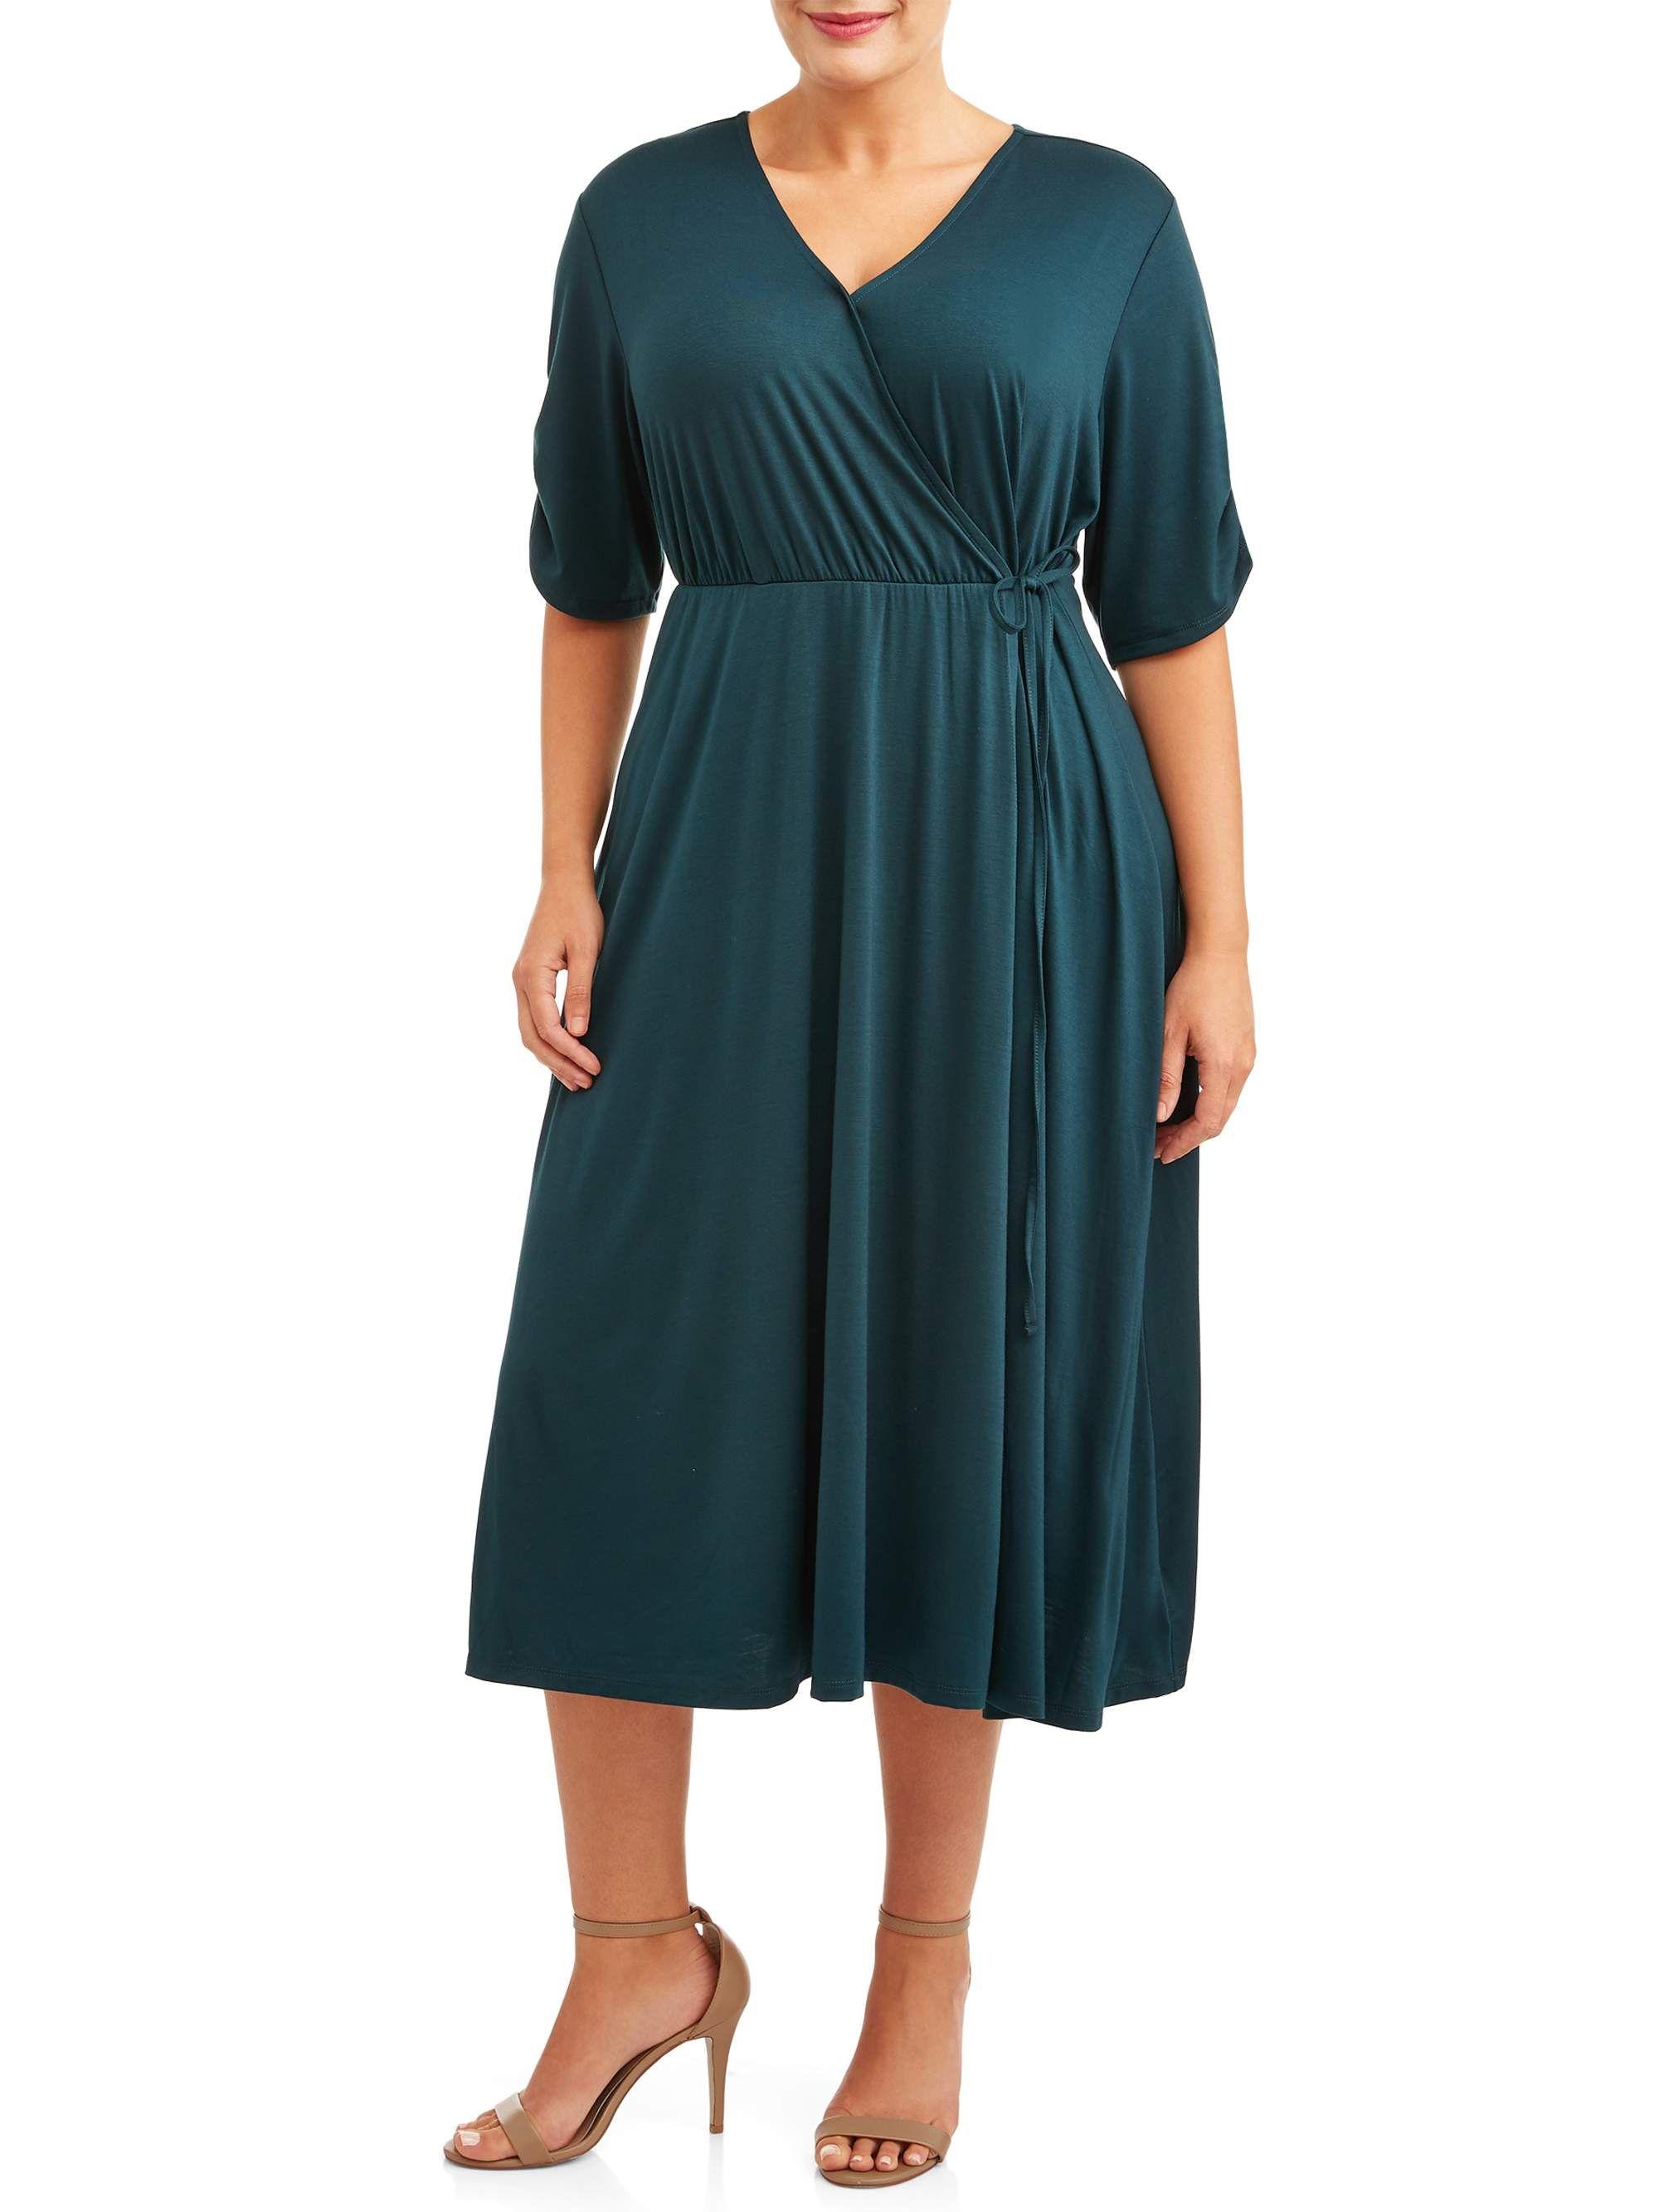 Terra Sky Terra Sky Women S Plus Size Midi Faux Wrap Dress Walmart Com Wrap Dress Faux Wrap Dress Dresses [ 2667 x 2000 Pixel ]